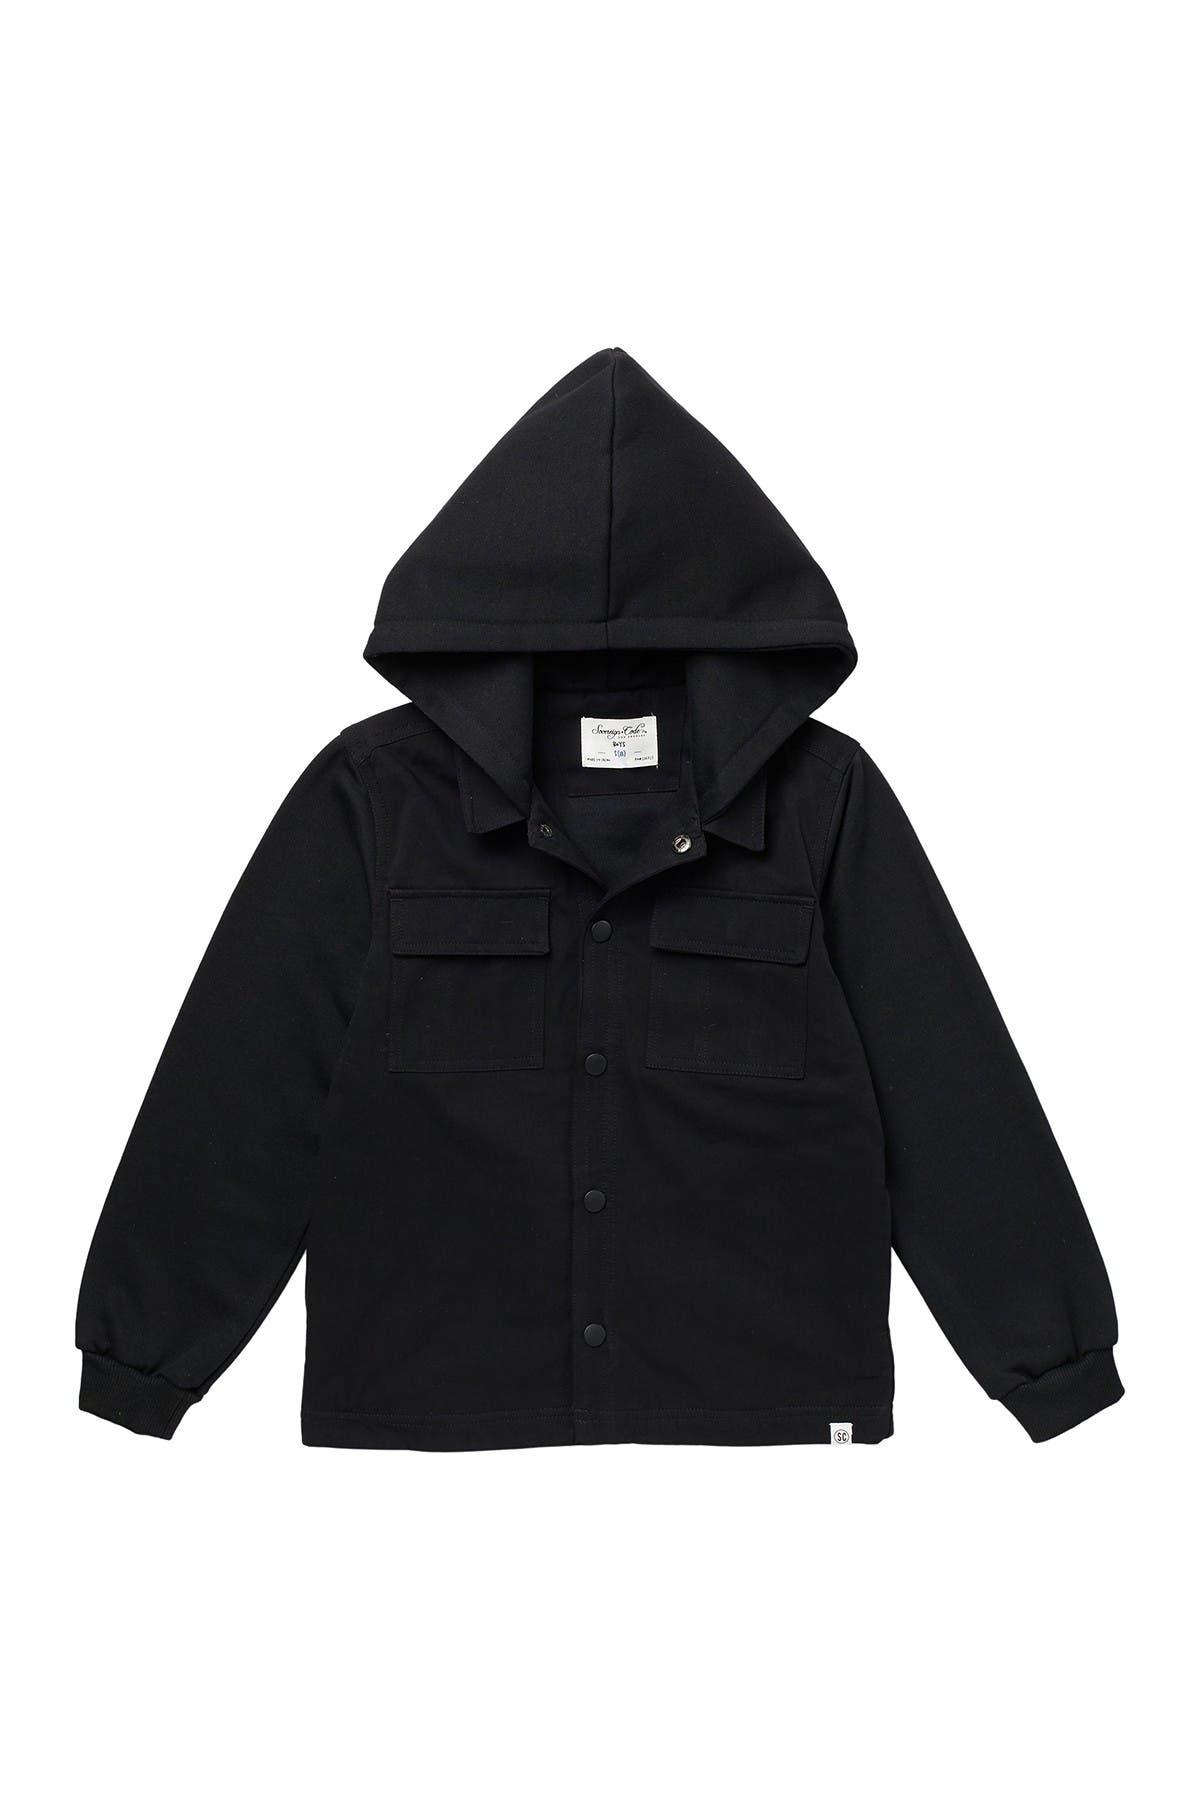 Image of Sovereign Code Murdock Hooded Shirt Jacket